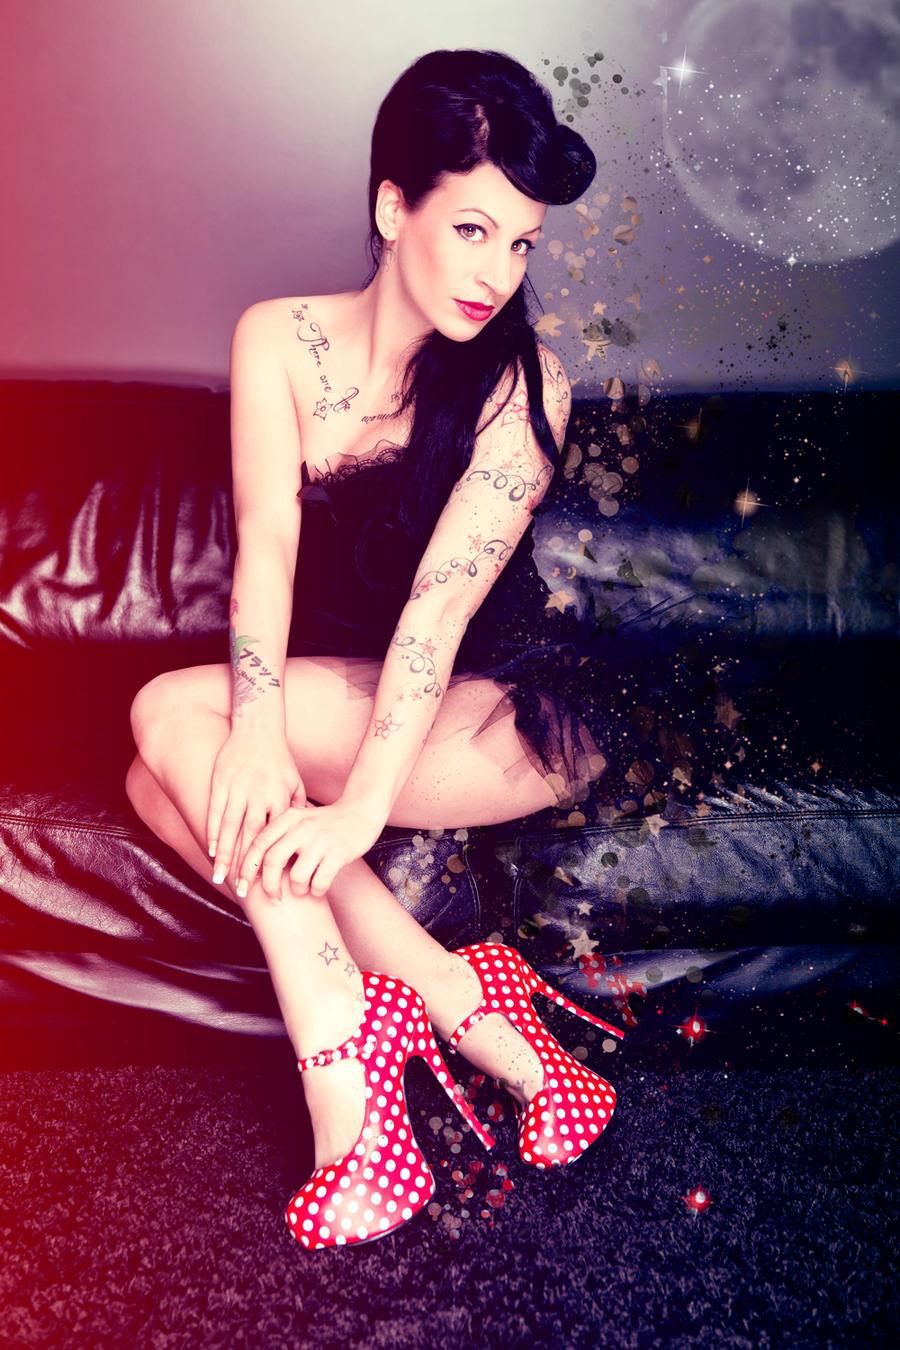 rockabilly lady